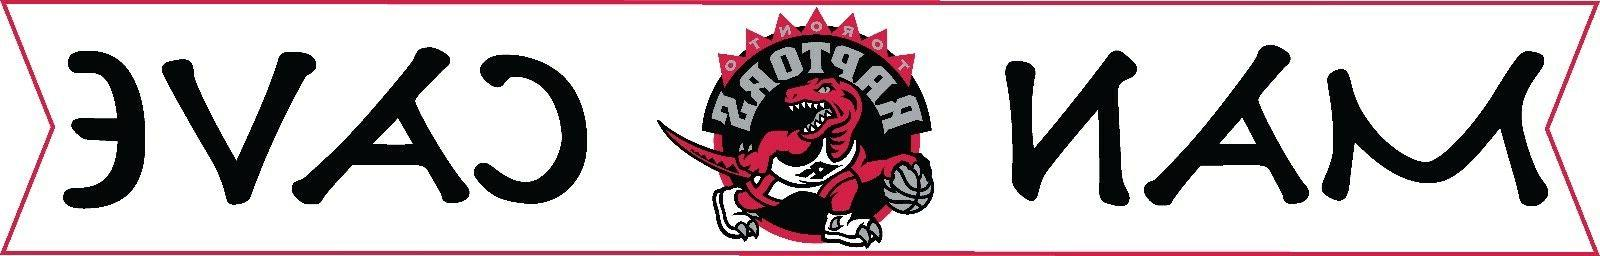 Toronto Raptors Logo Wall CG2453